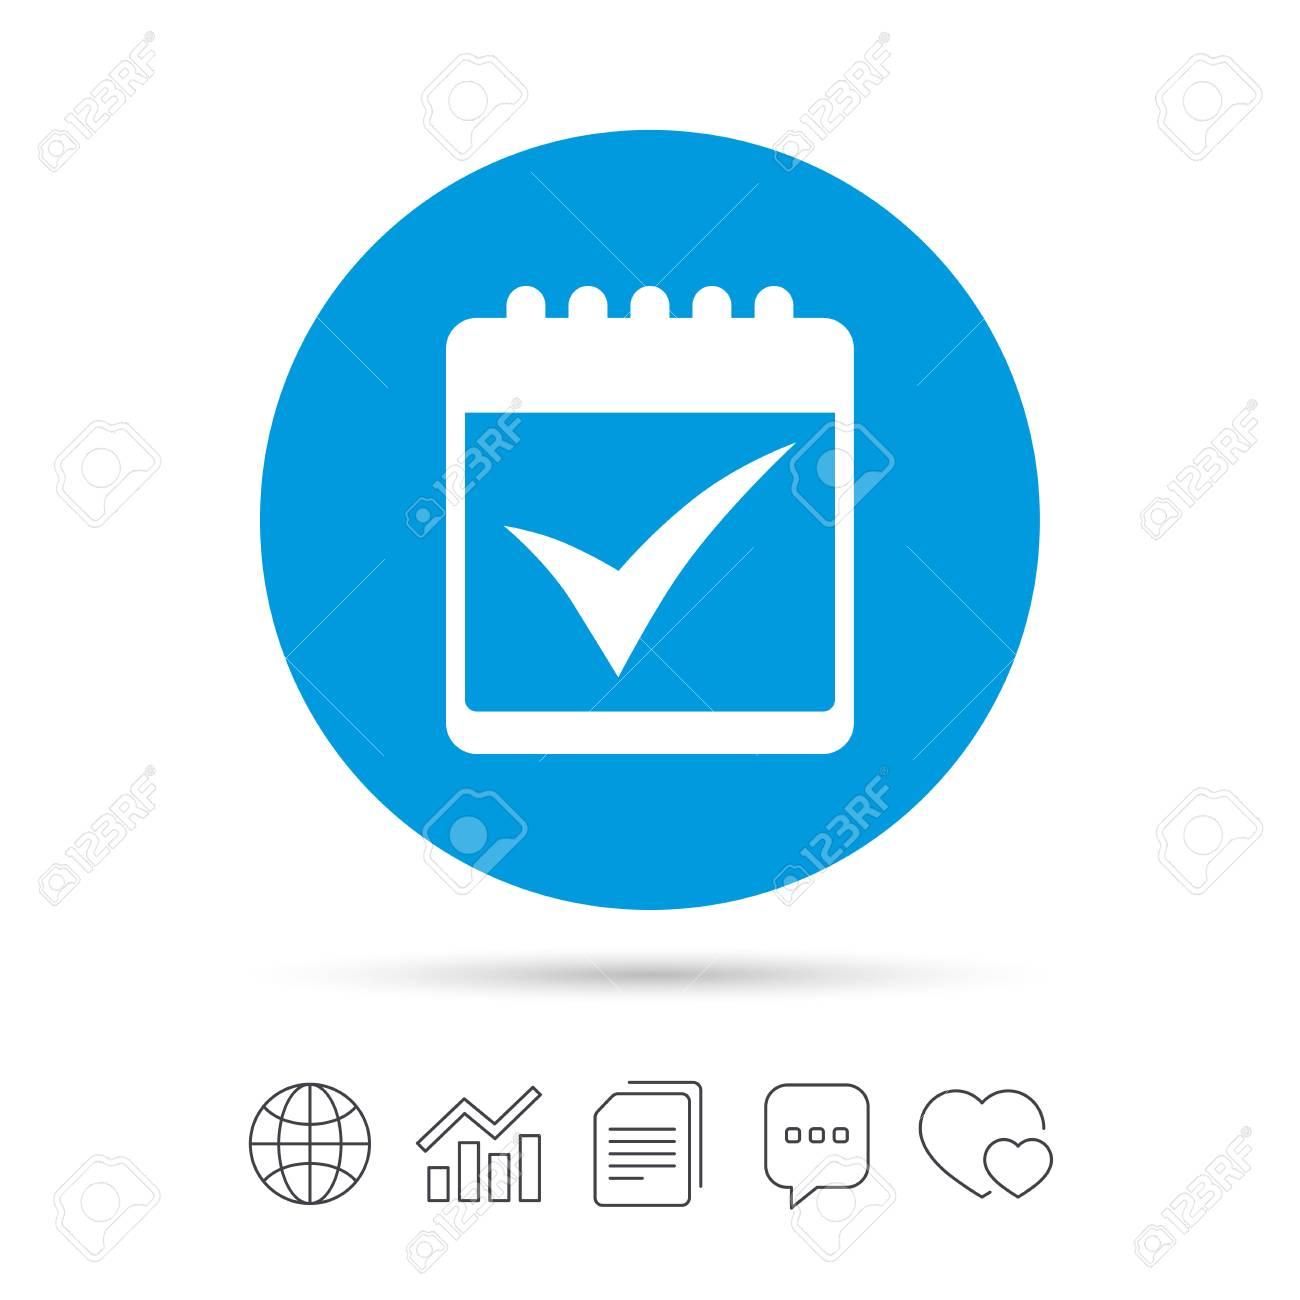 Calendar Sign Icon Check Mark Symbol Copy Files Chat Speech